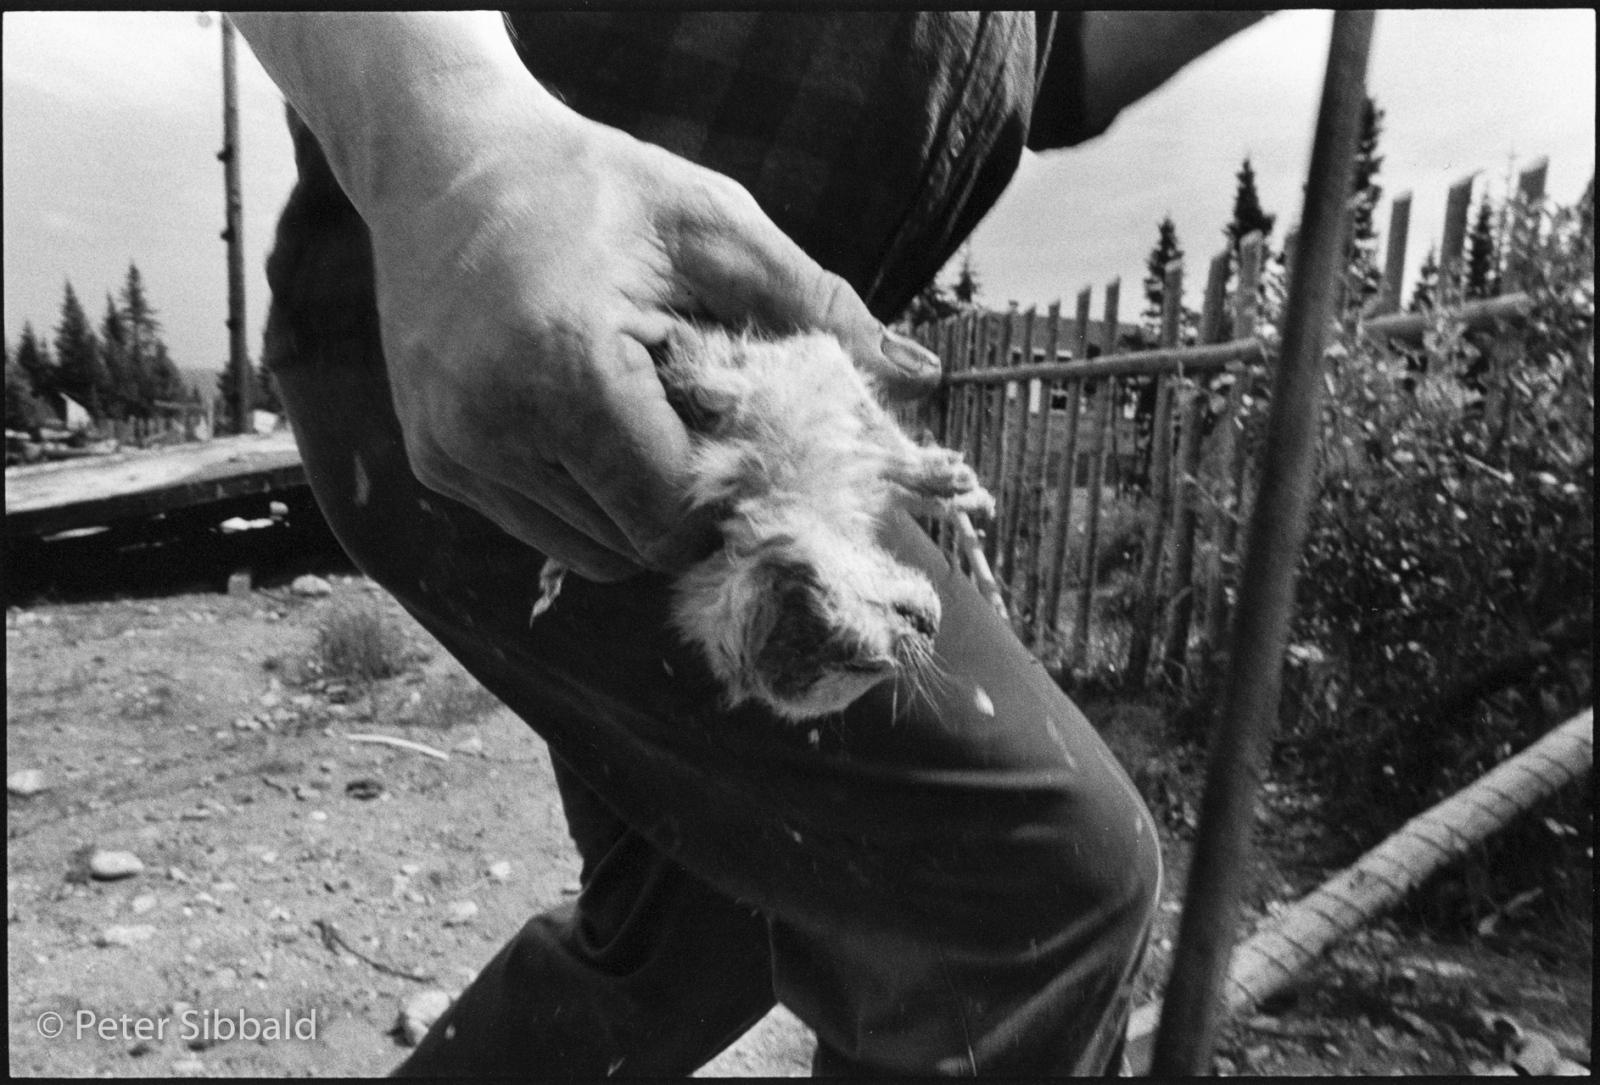 Dave Hart burying a dead kitten, Sheshatshiu, Nitassinan/Labrador. Copyright Peter Sibbald, 1993.